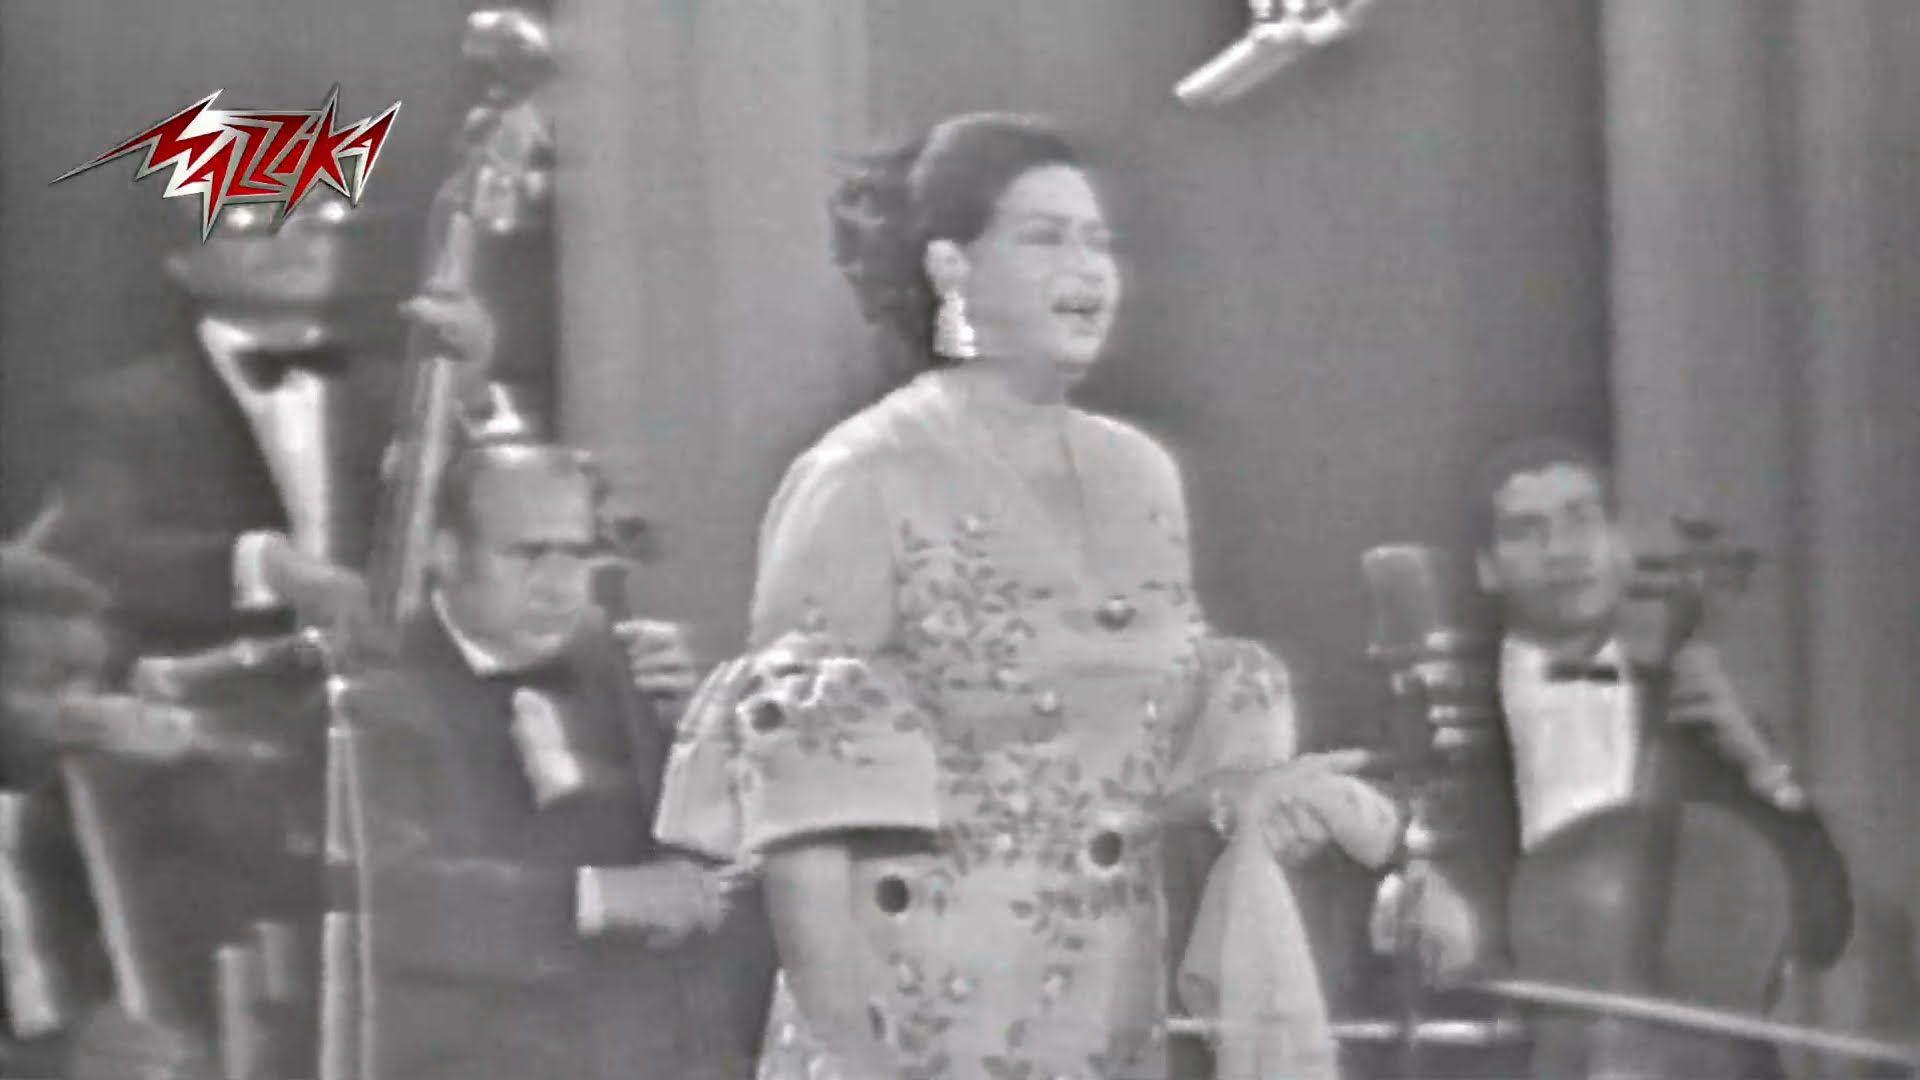 Aghadan Alqak Concert Umm Kulthum اغدا القاك حفلة ام كلثوم Concert Statue Greek Statue